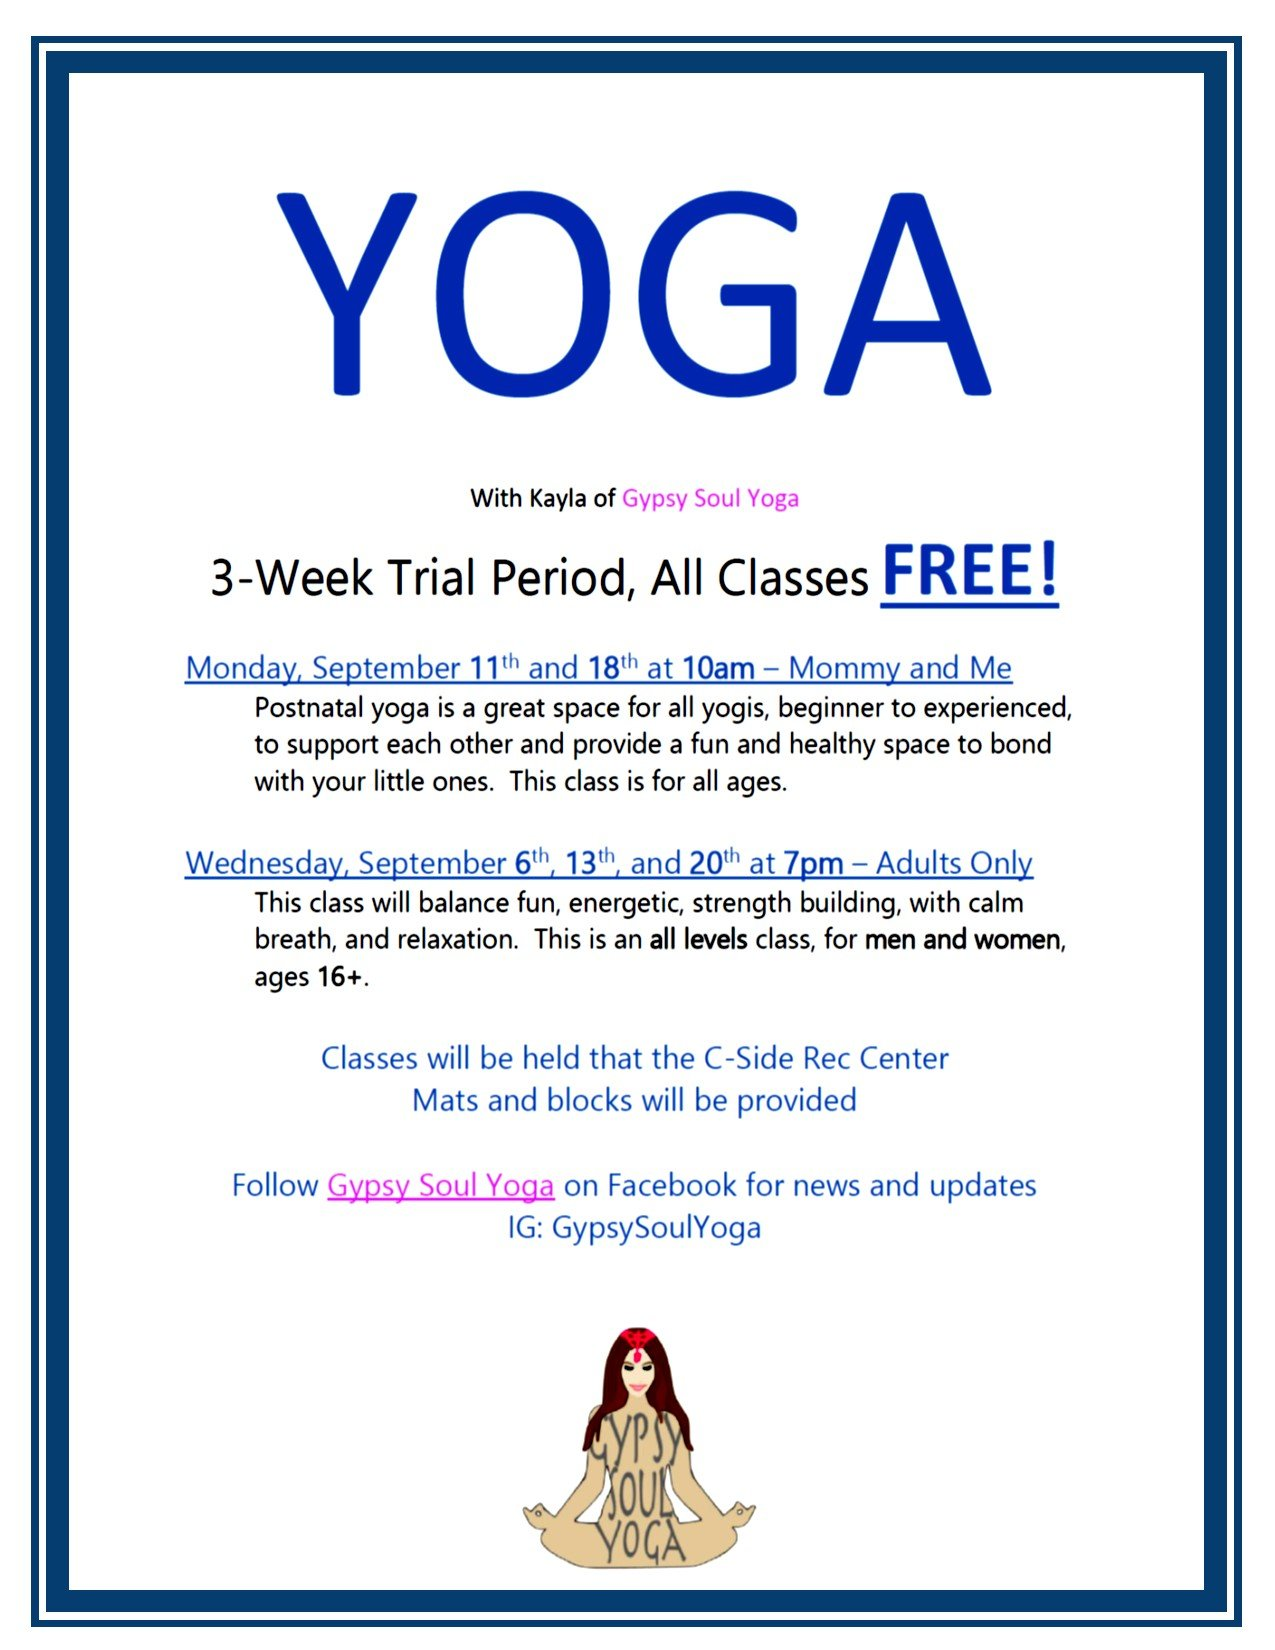 yoga flyer2